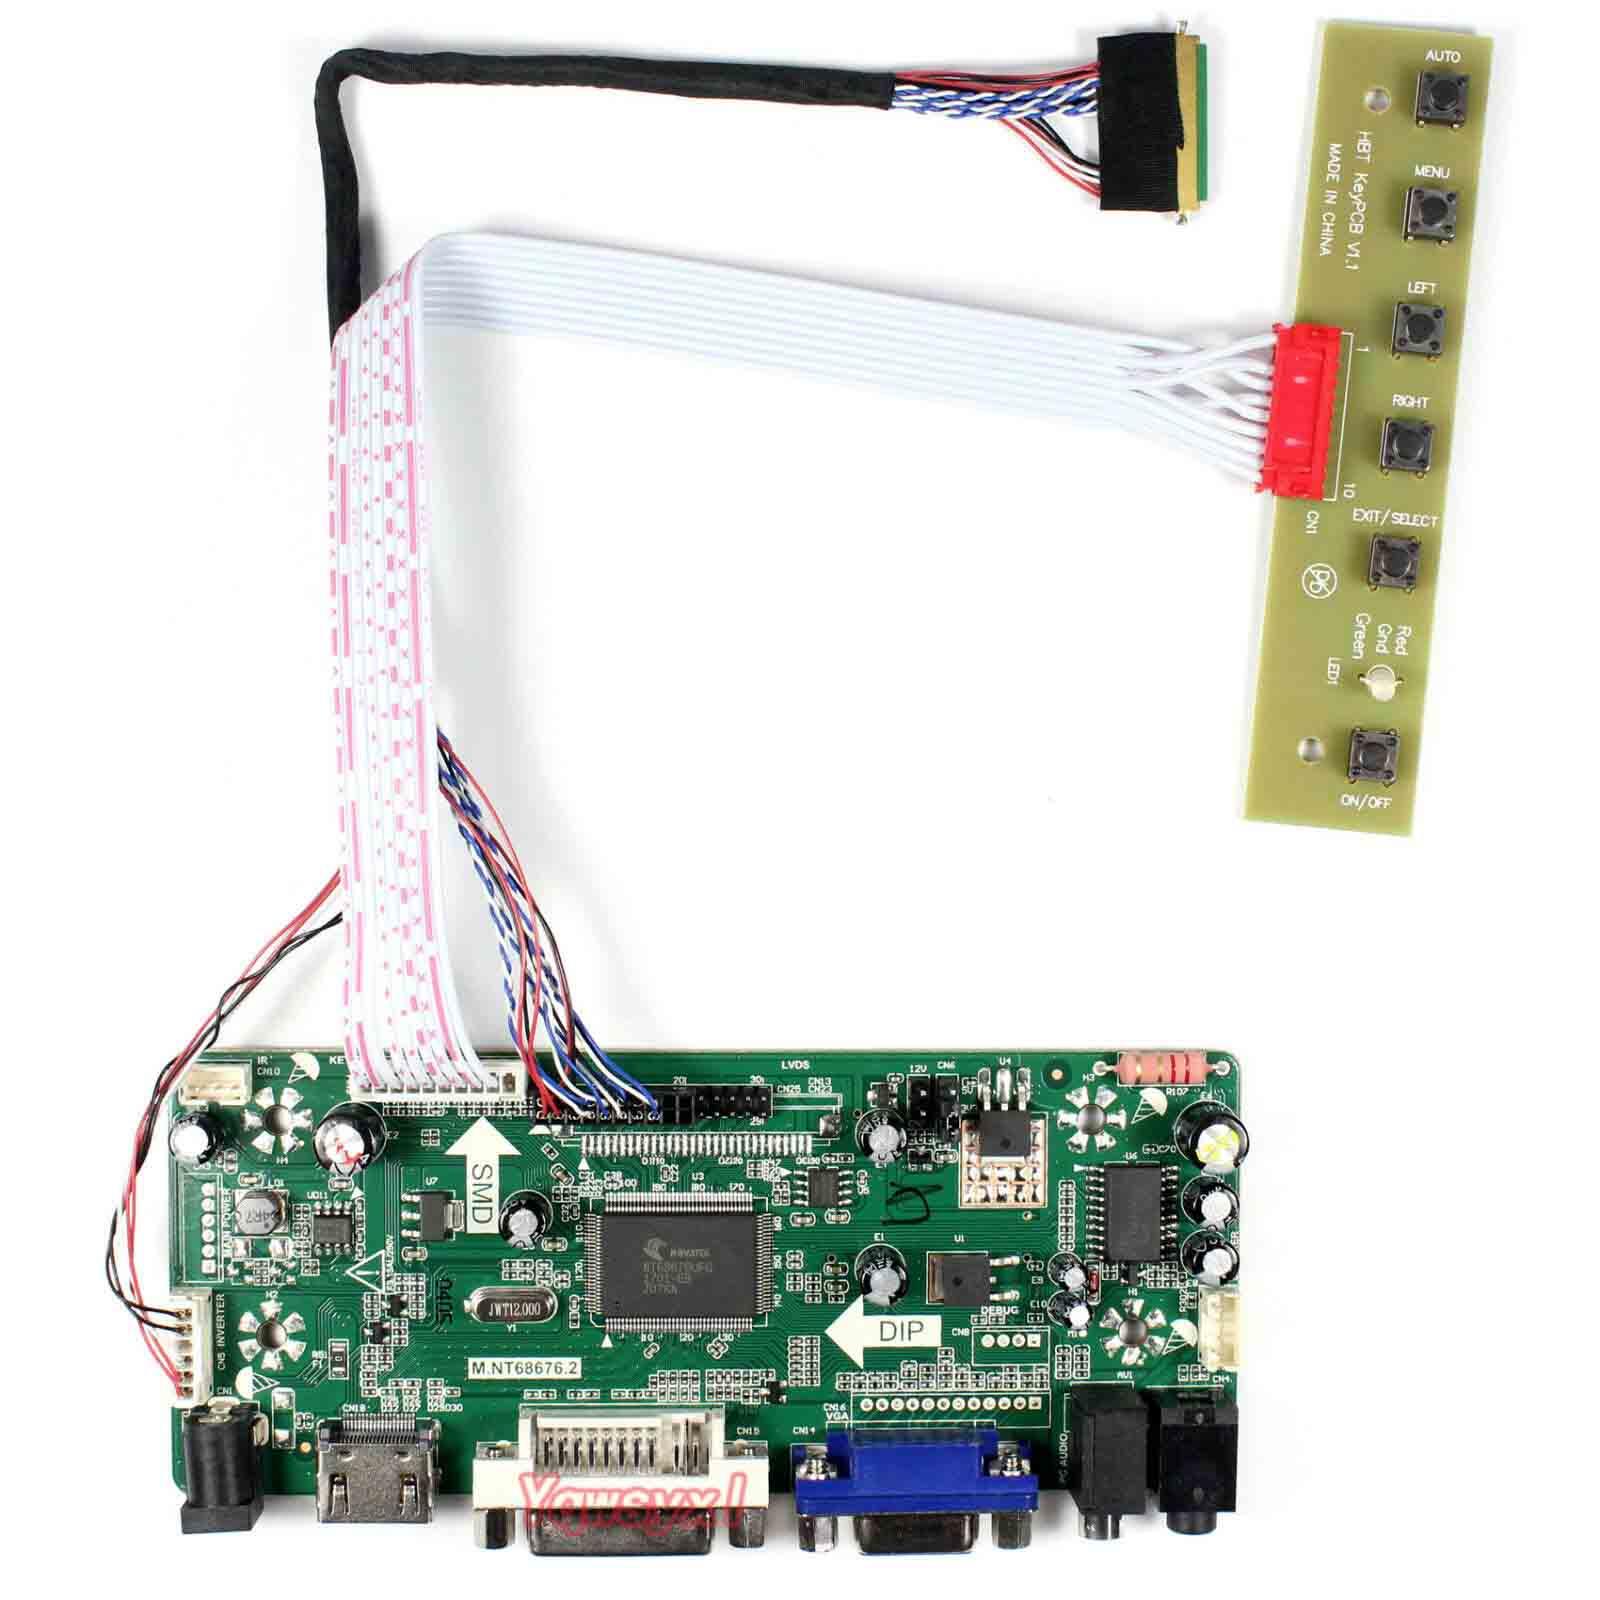 Yqwsyxl Control Board Monitor Kit For HSD121PHW1-A01 HDMI+DVI+VGA LCD LED  Screen  Controller Board Driver